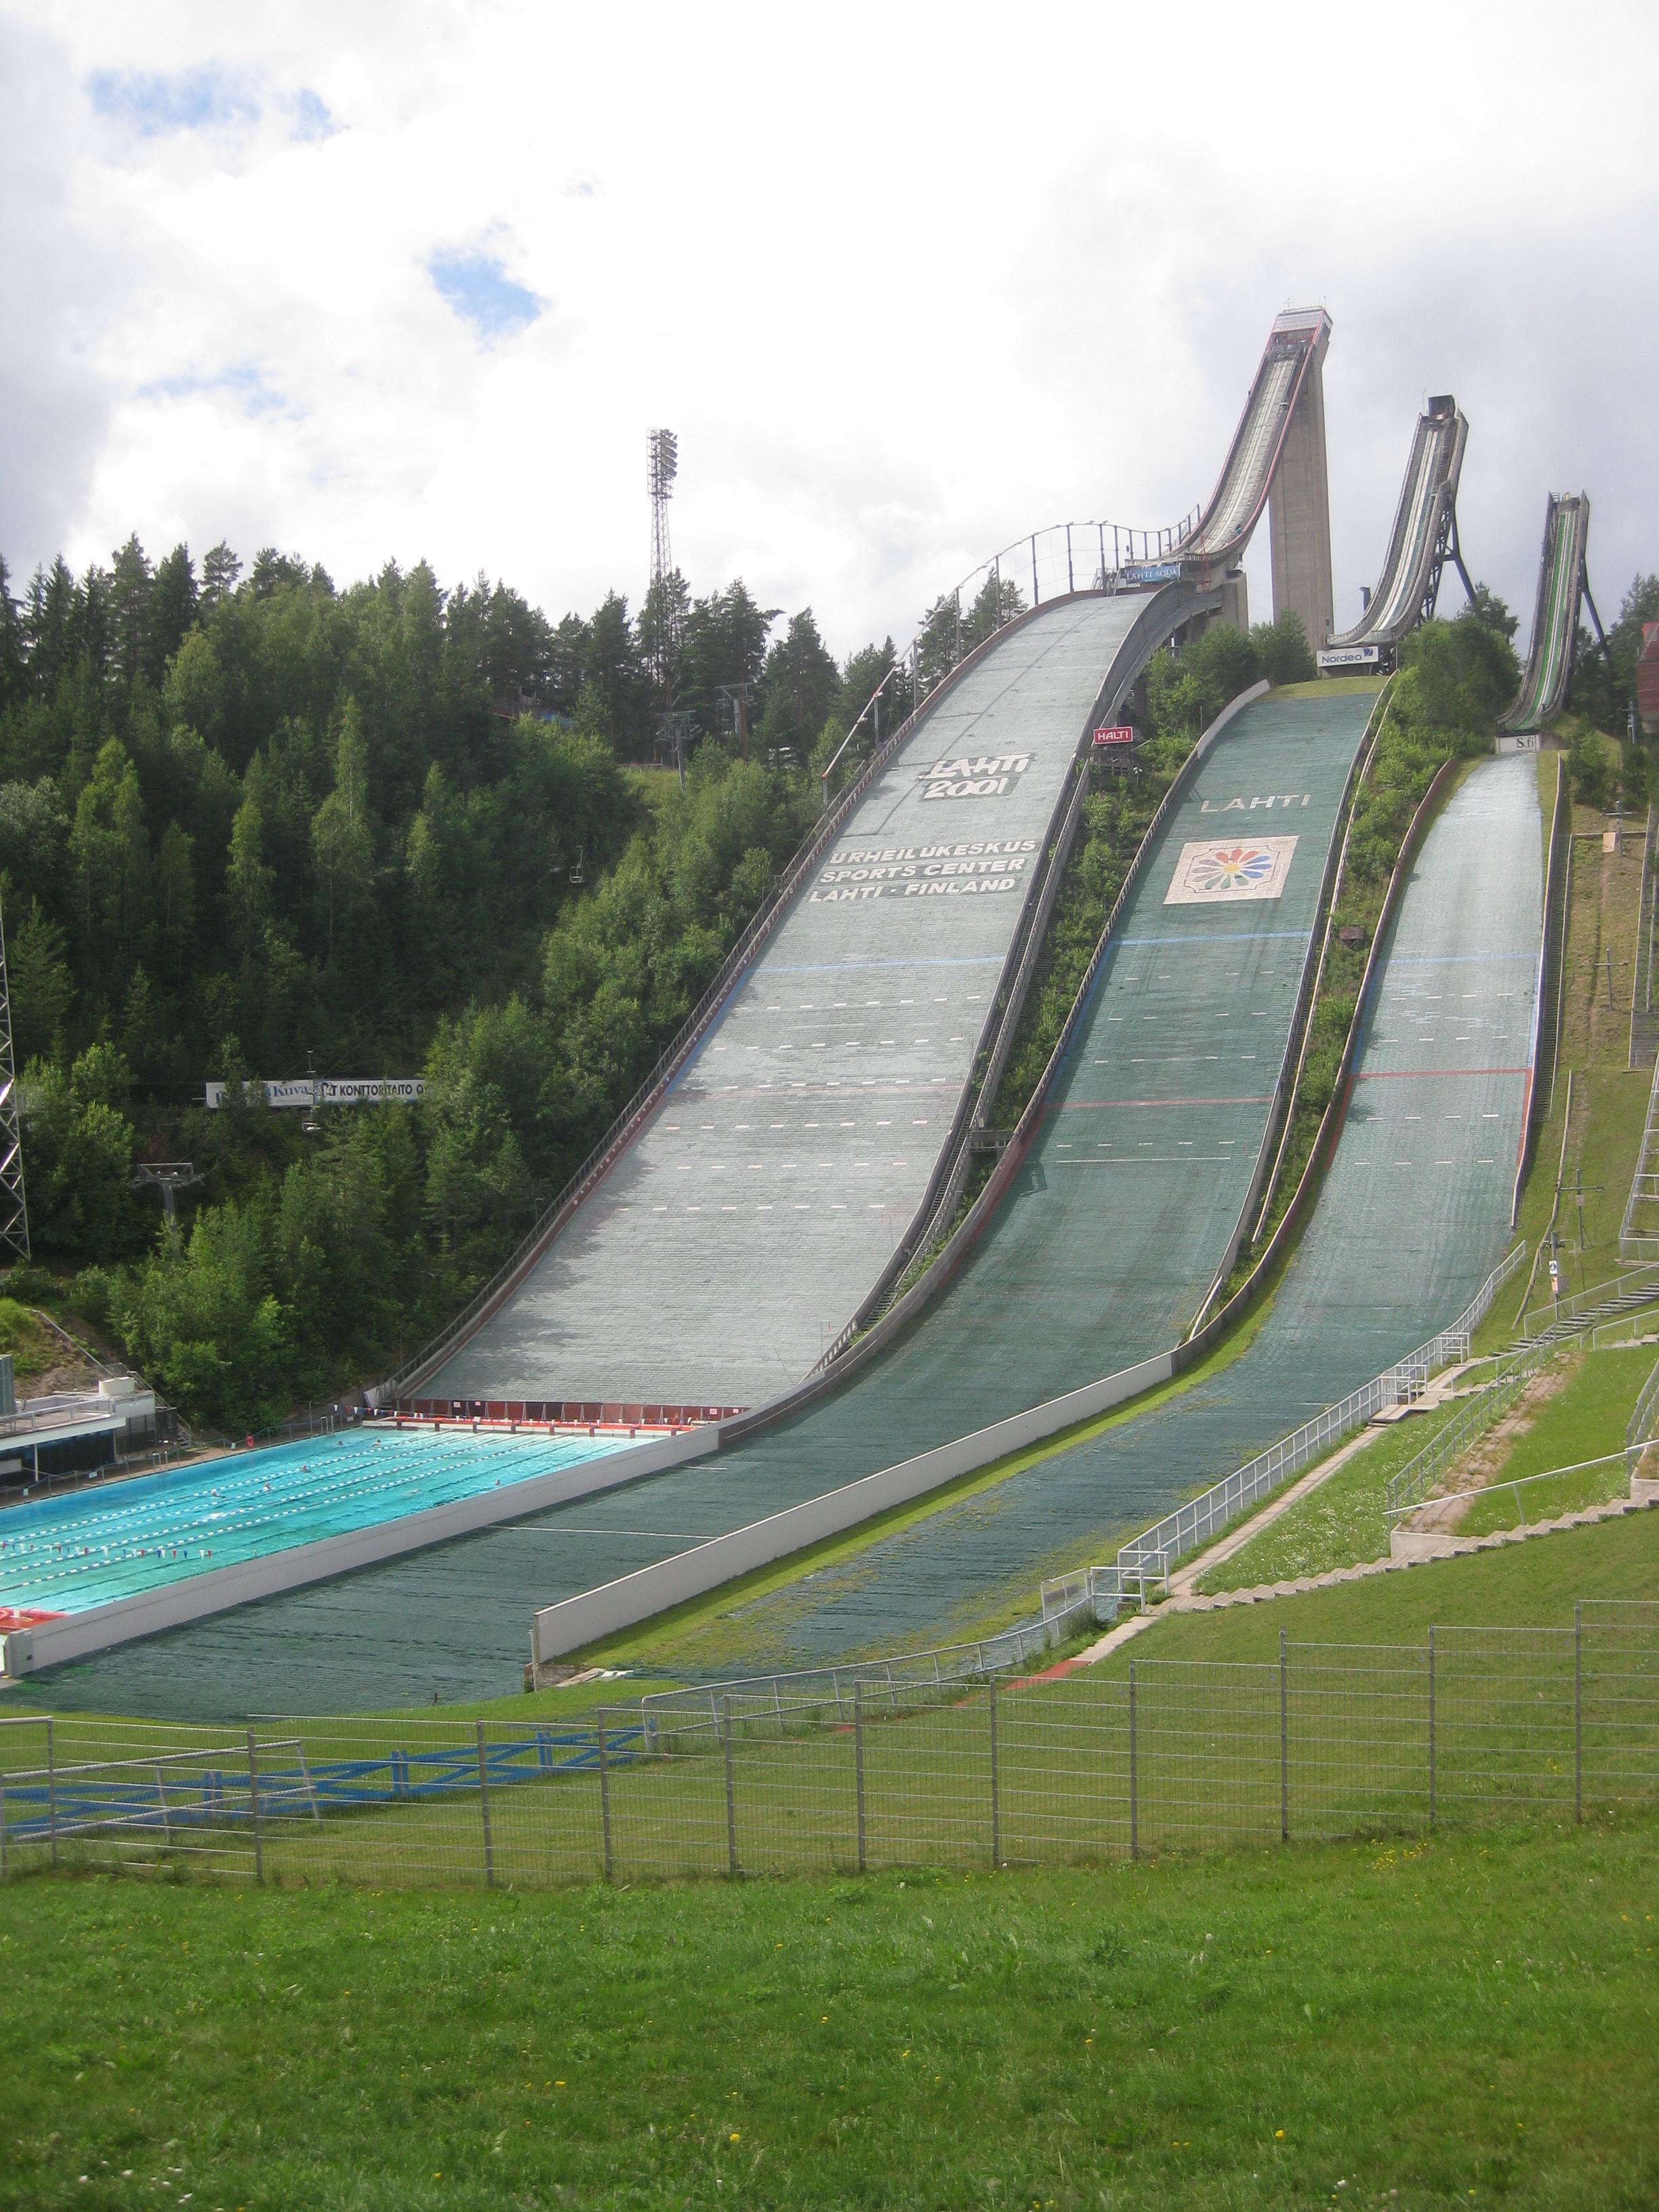 File:Salpausselkä ski jumping hill in summer.JPG - Wikimedia Commons